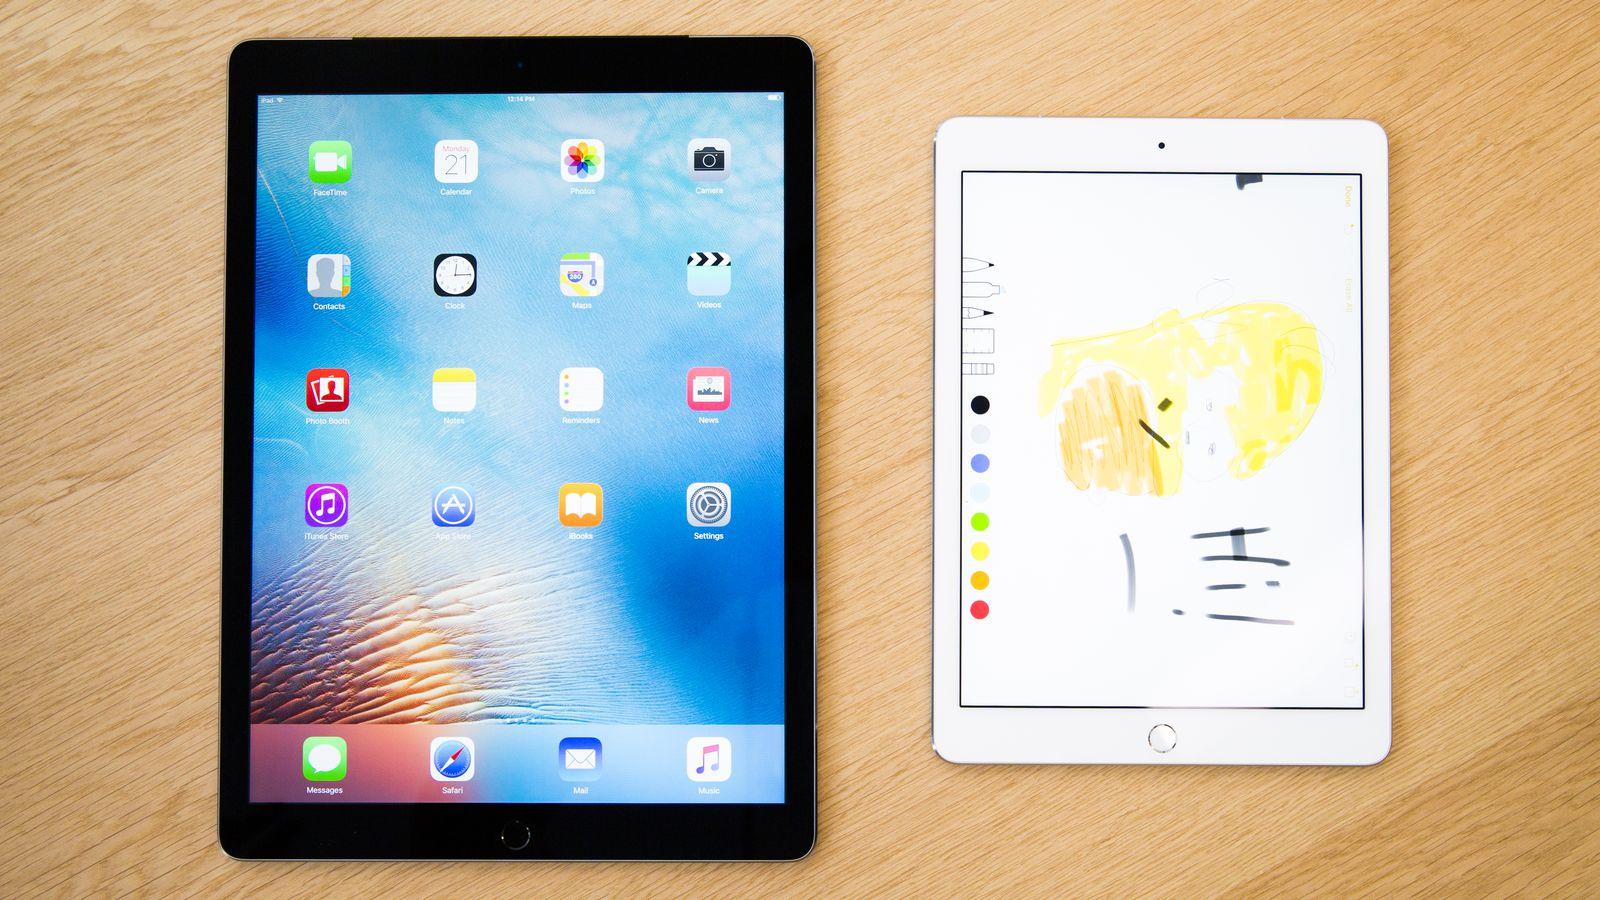 apple ipad in india case study